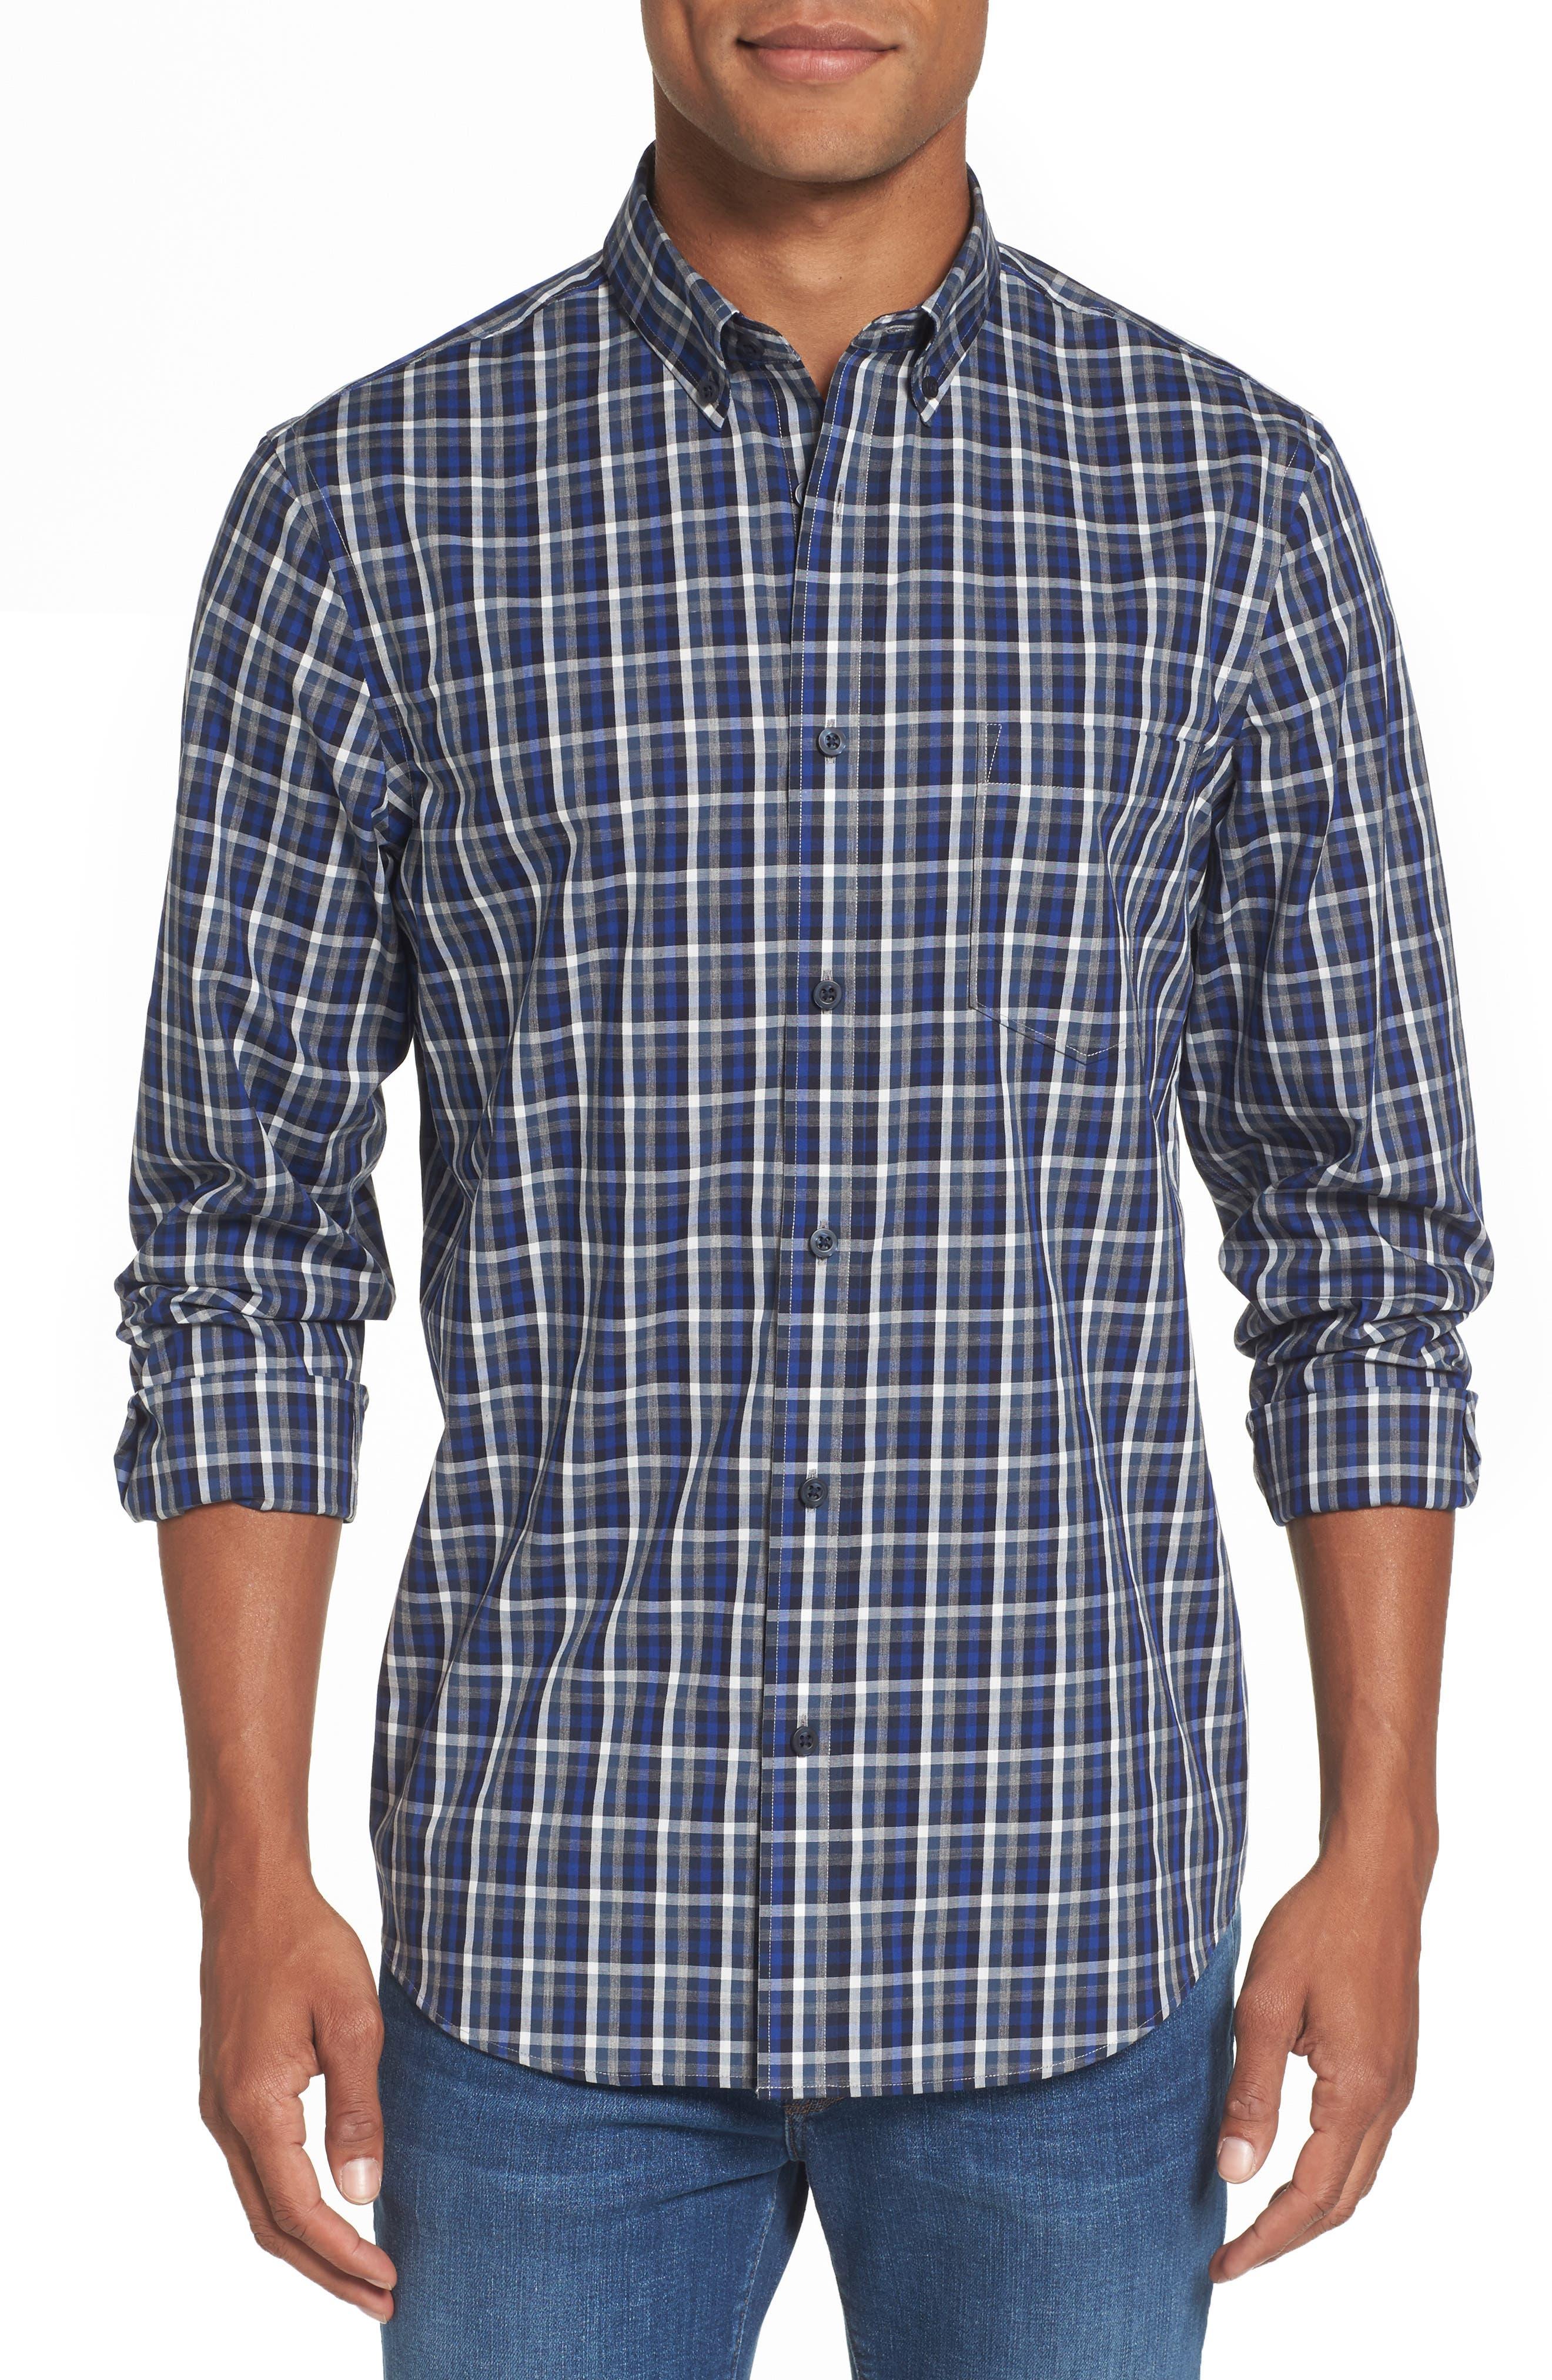 Main Image - Nordstrom Men's Shop Regular Fit Non-Iron Spade Check Dress Shirt (Tall)